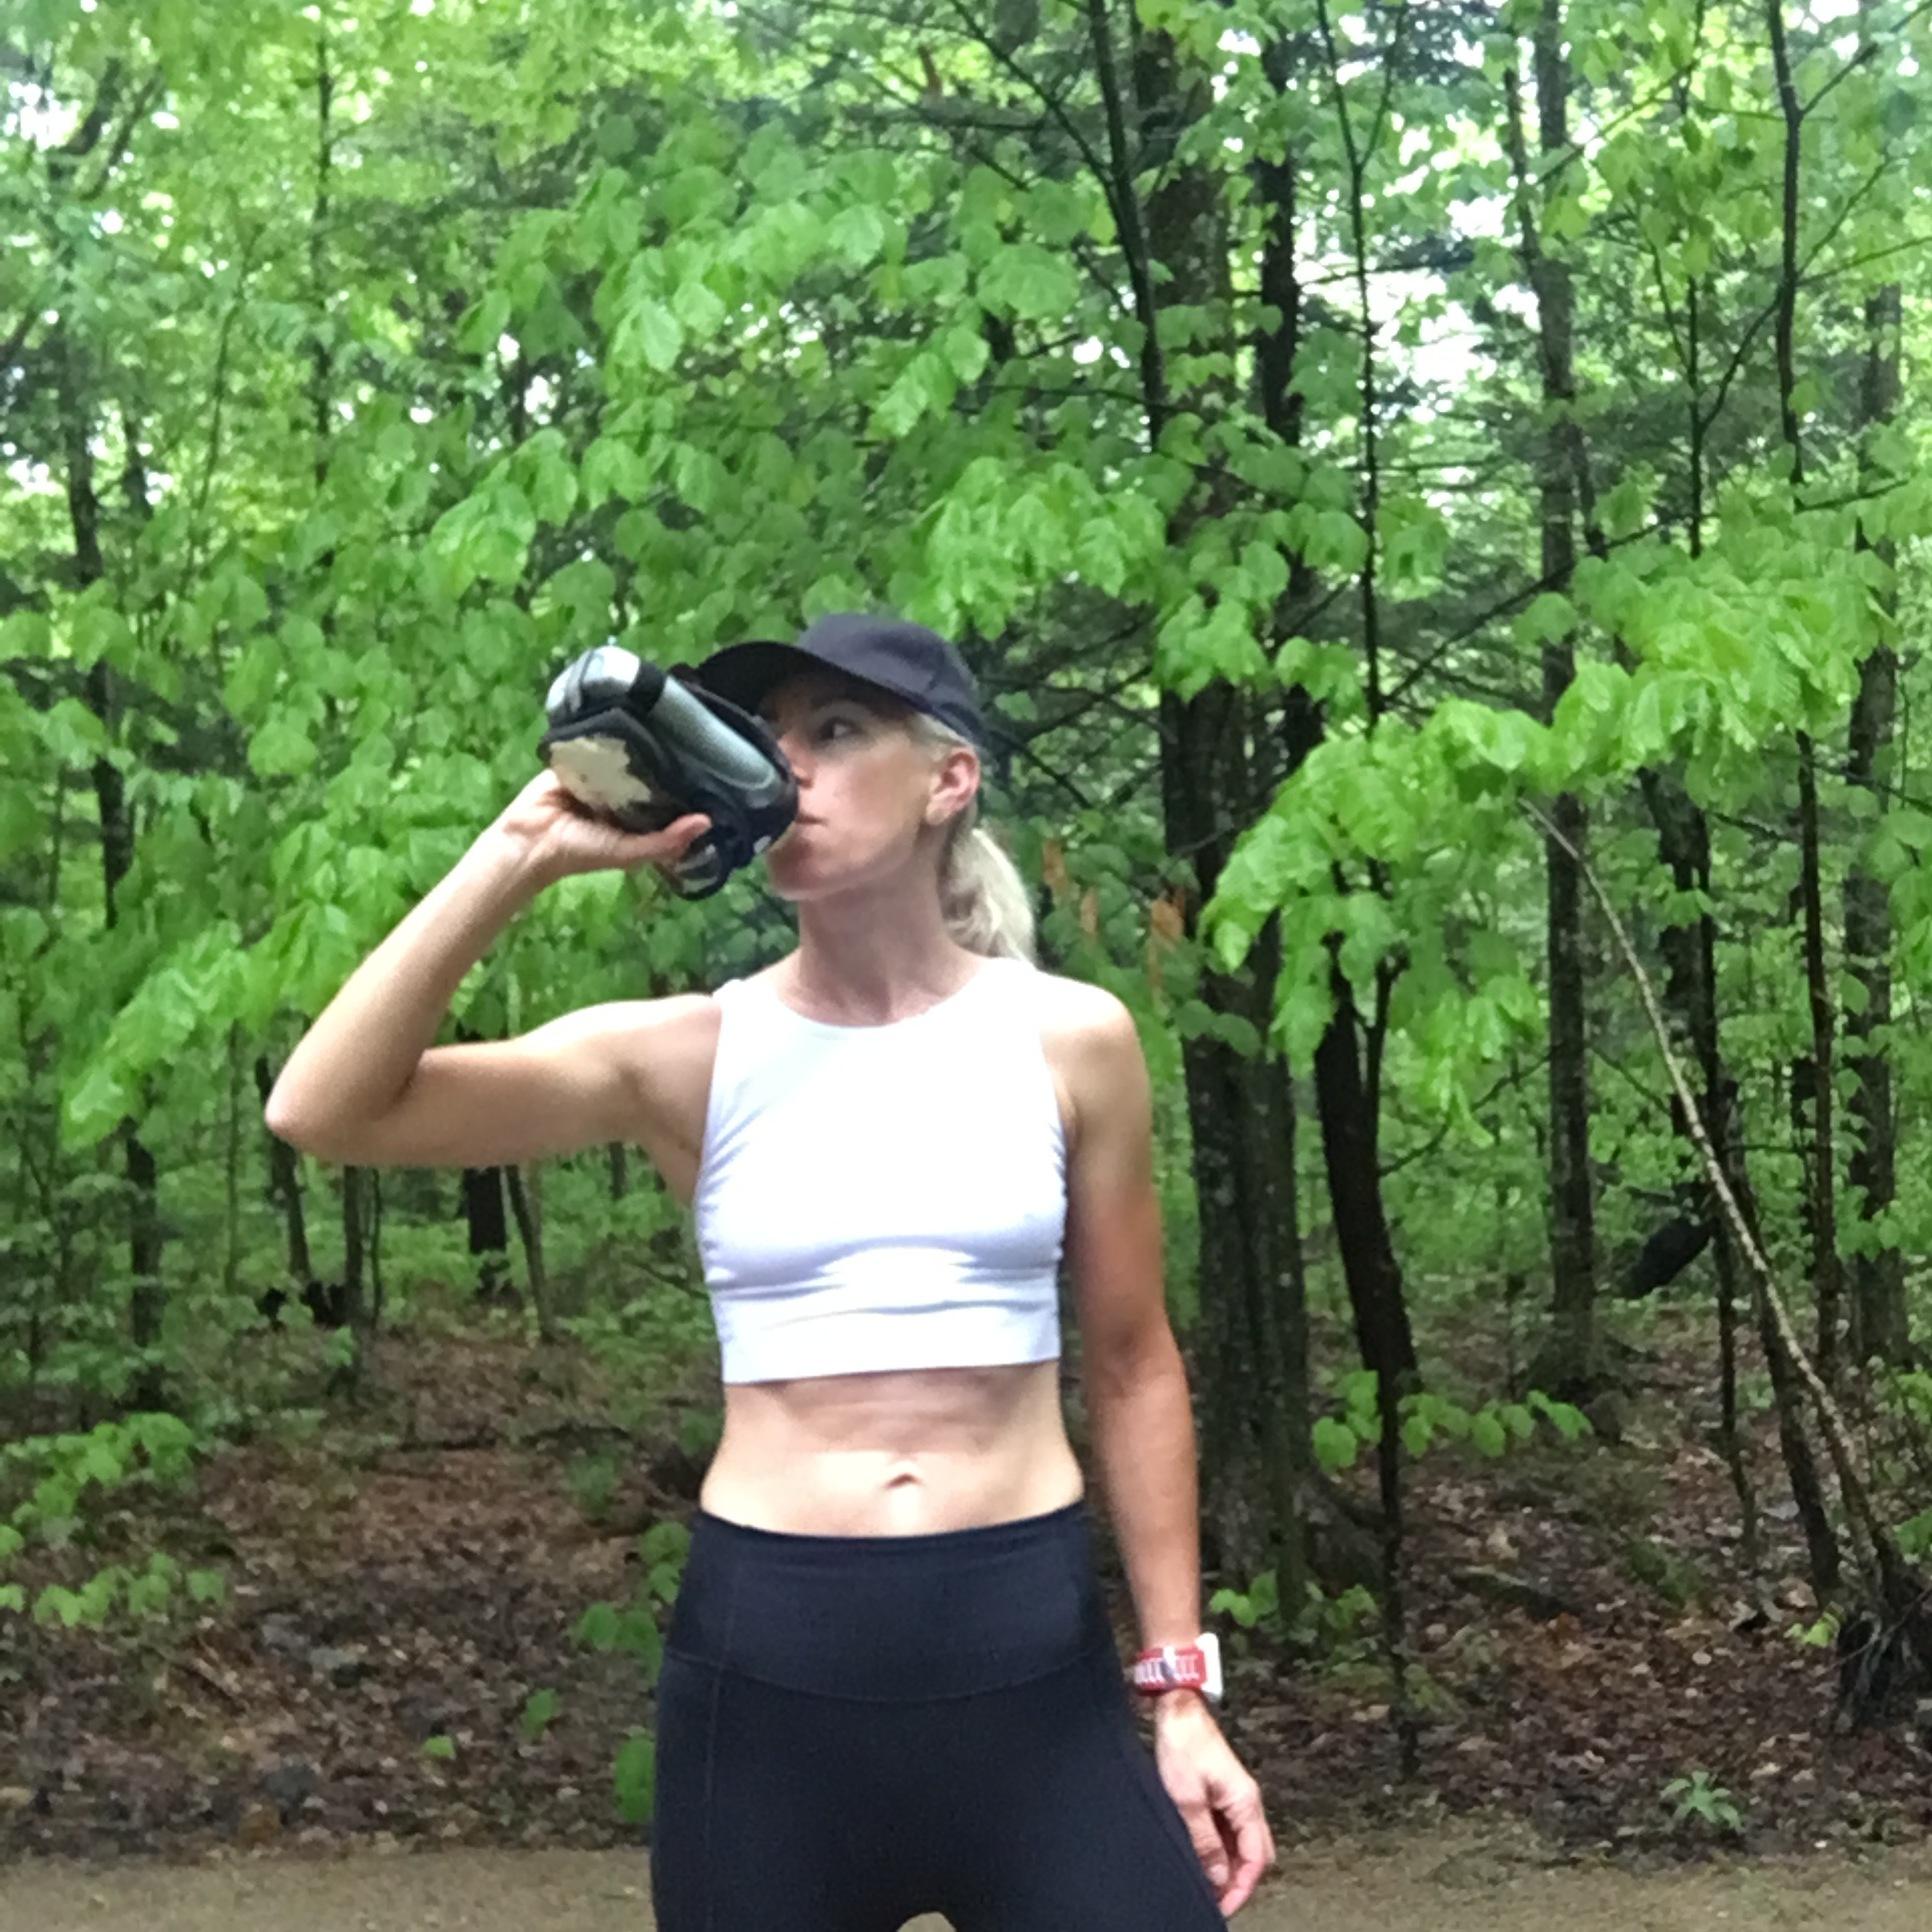 Muddy trail run for a little cross training